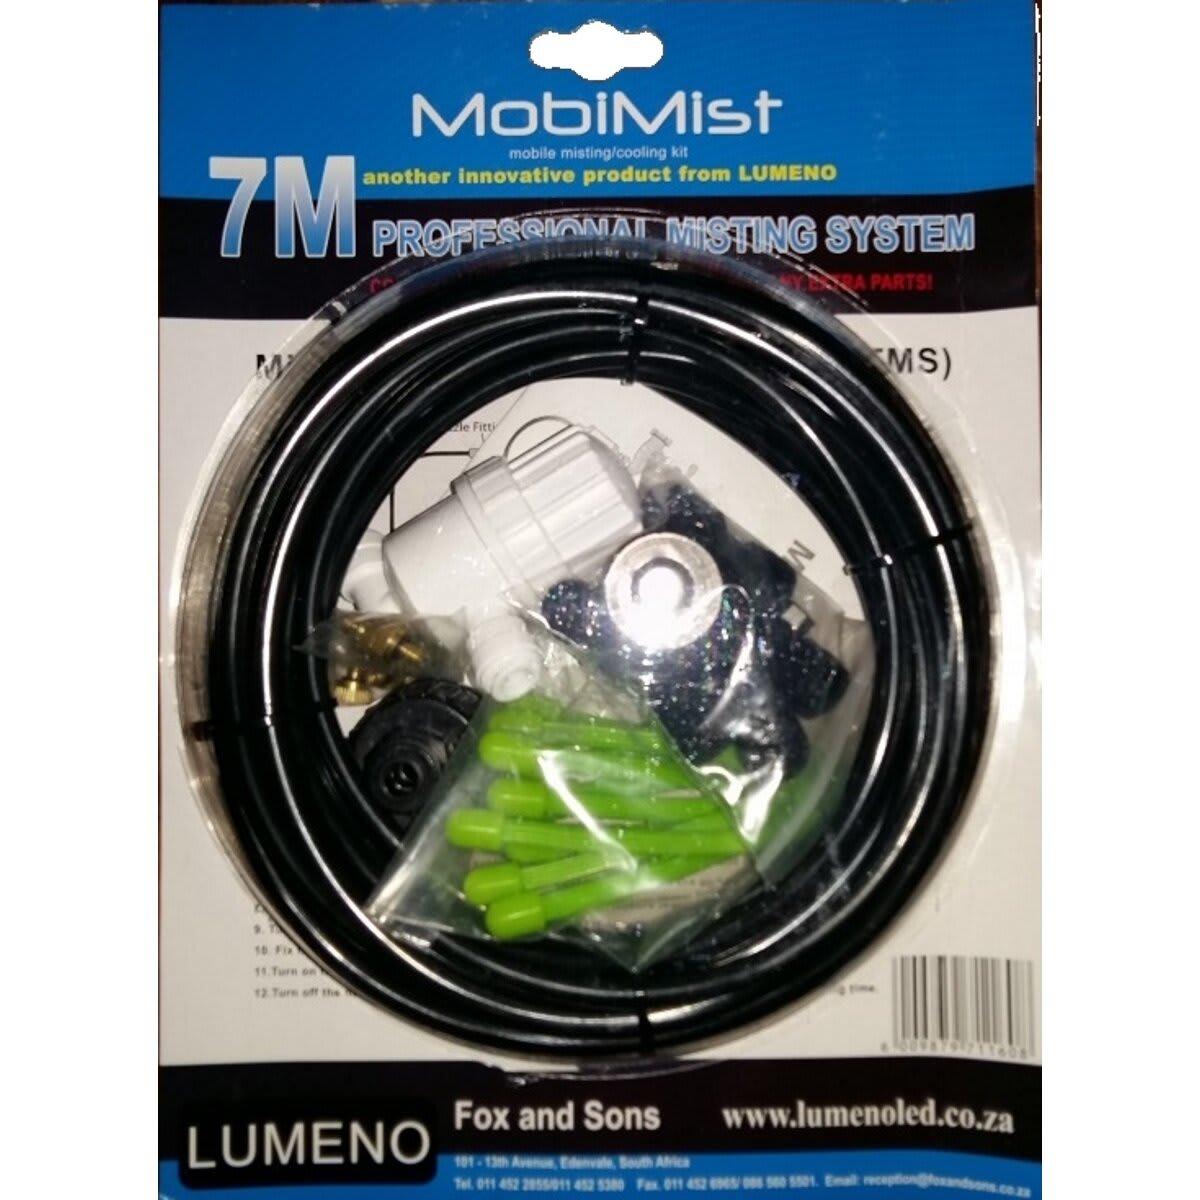 Lumeno MobiMist 7m Mobile Misting/Cooling Kit